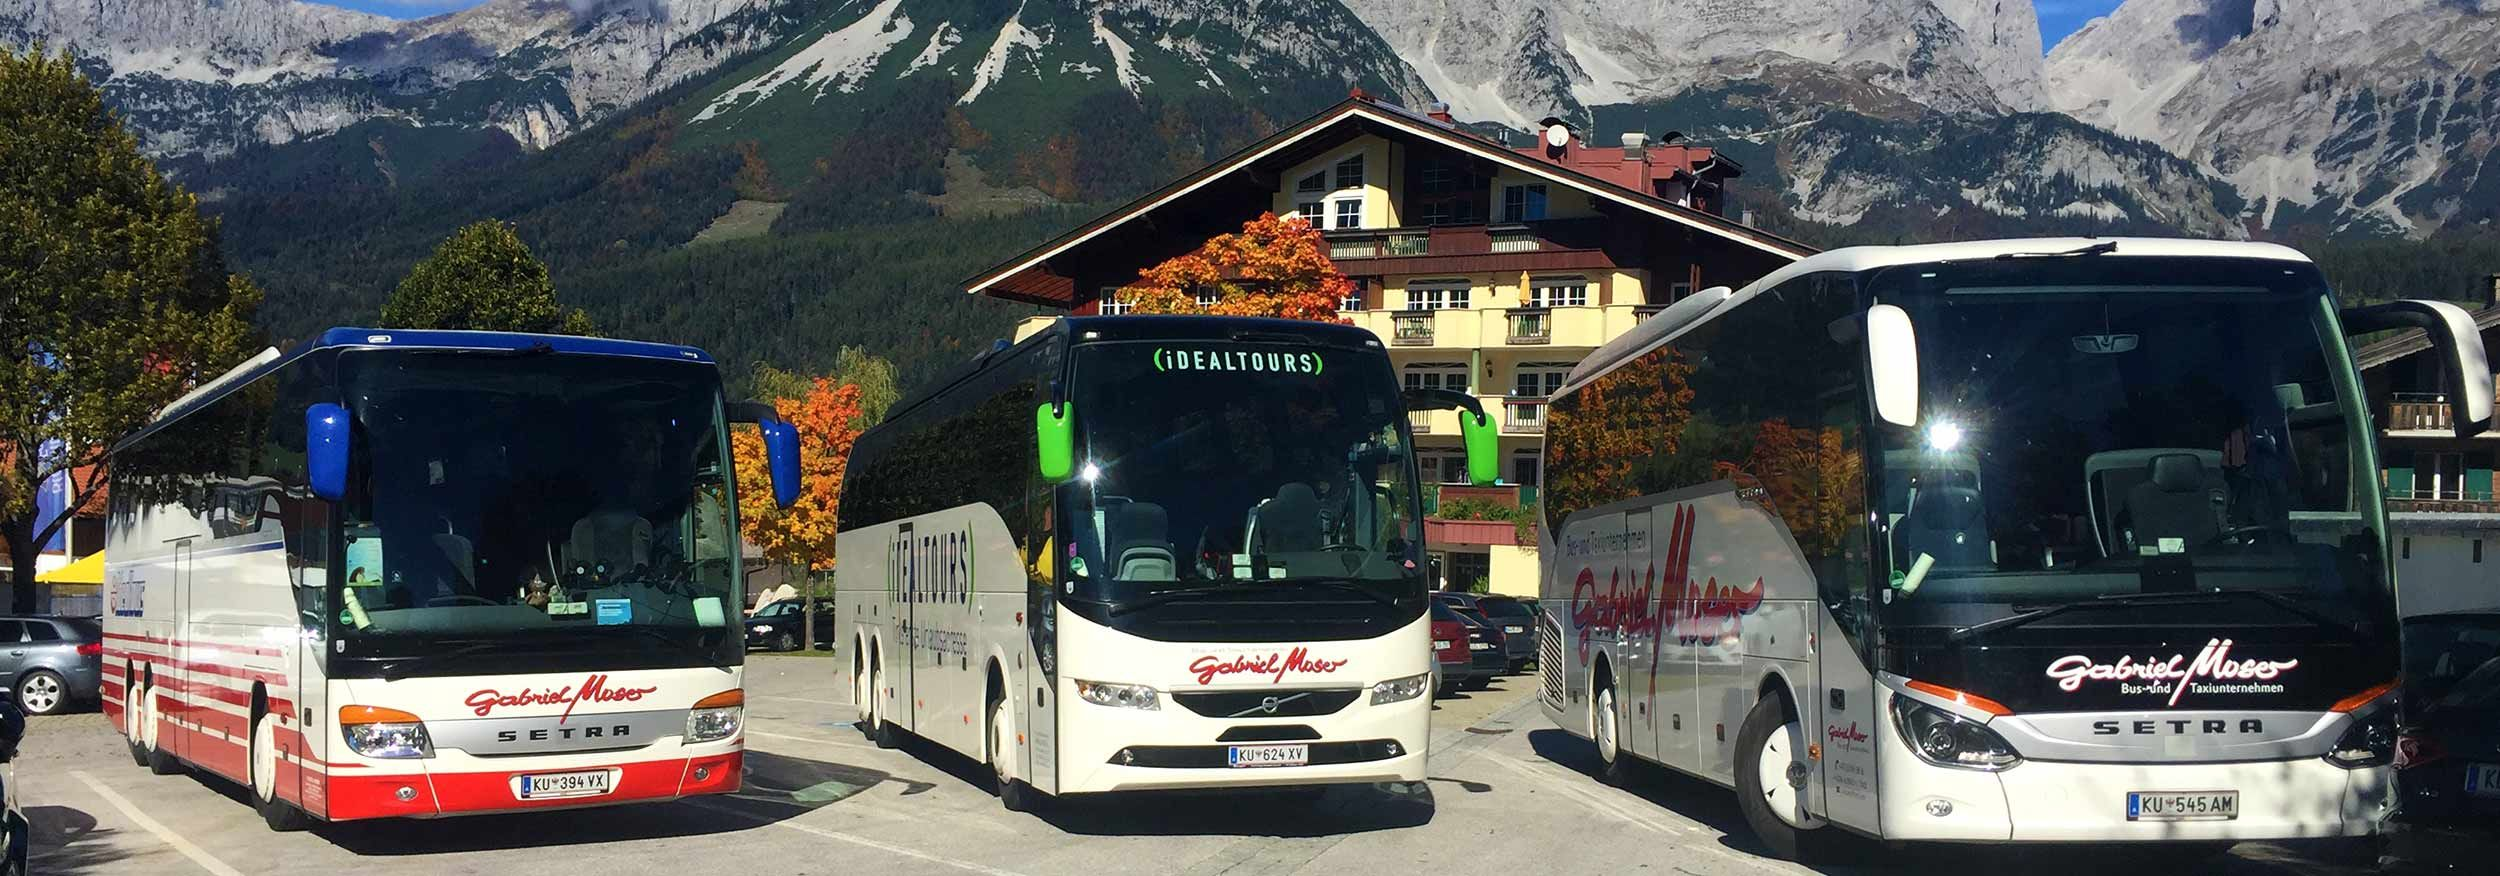 Bus- und Taxiunternehmen Gabriel Moser e.U.